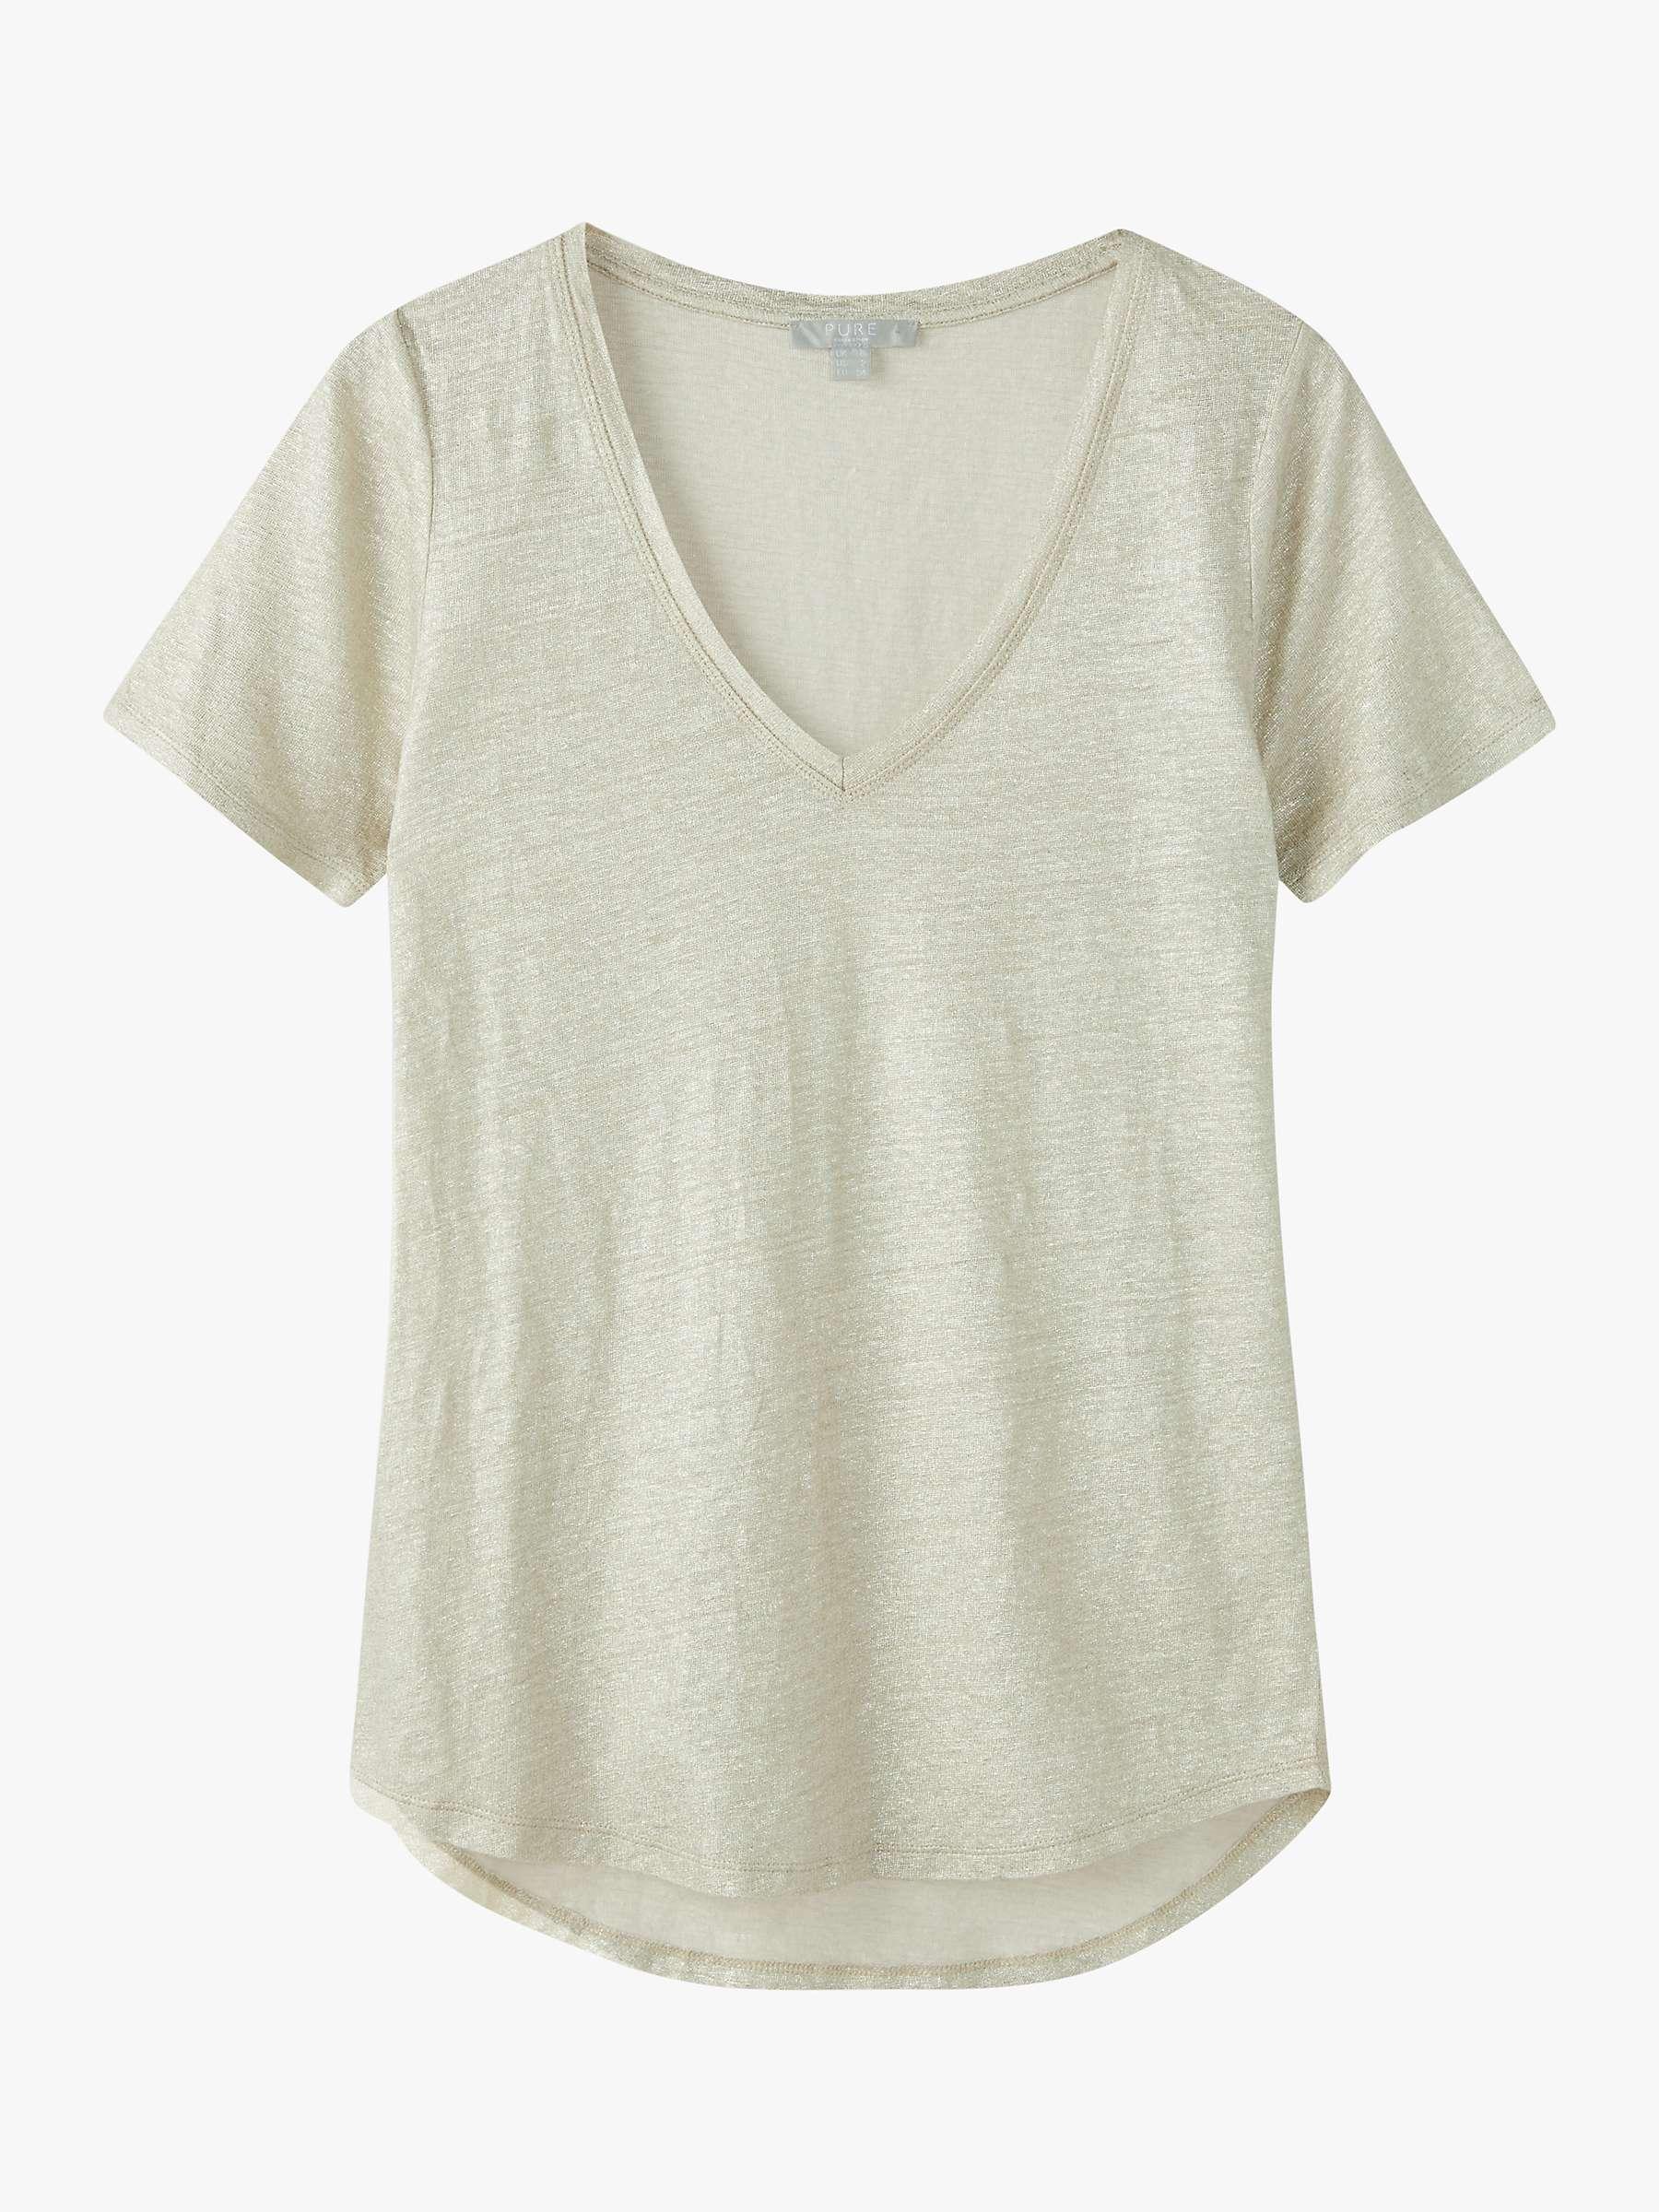 Linen jersey V-neck short sleeve top